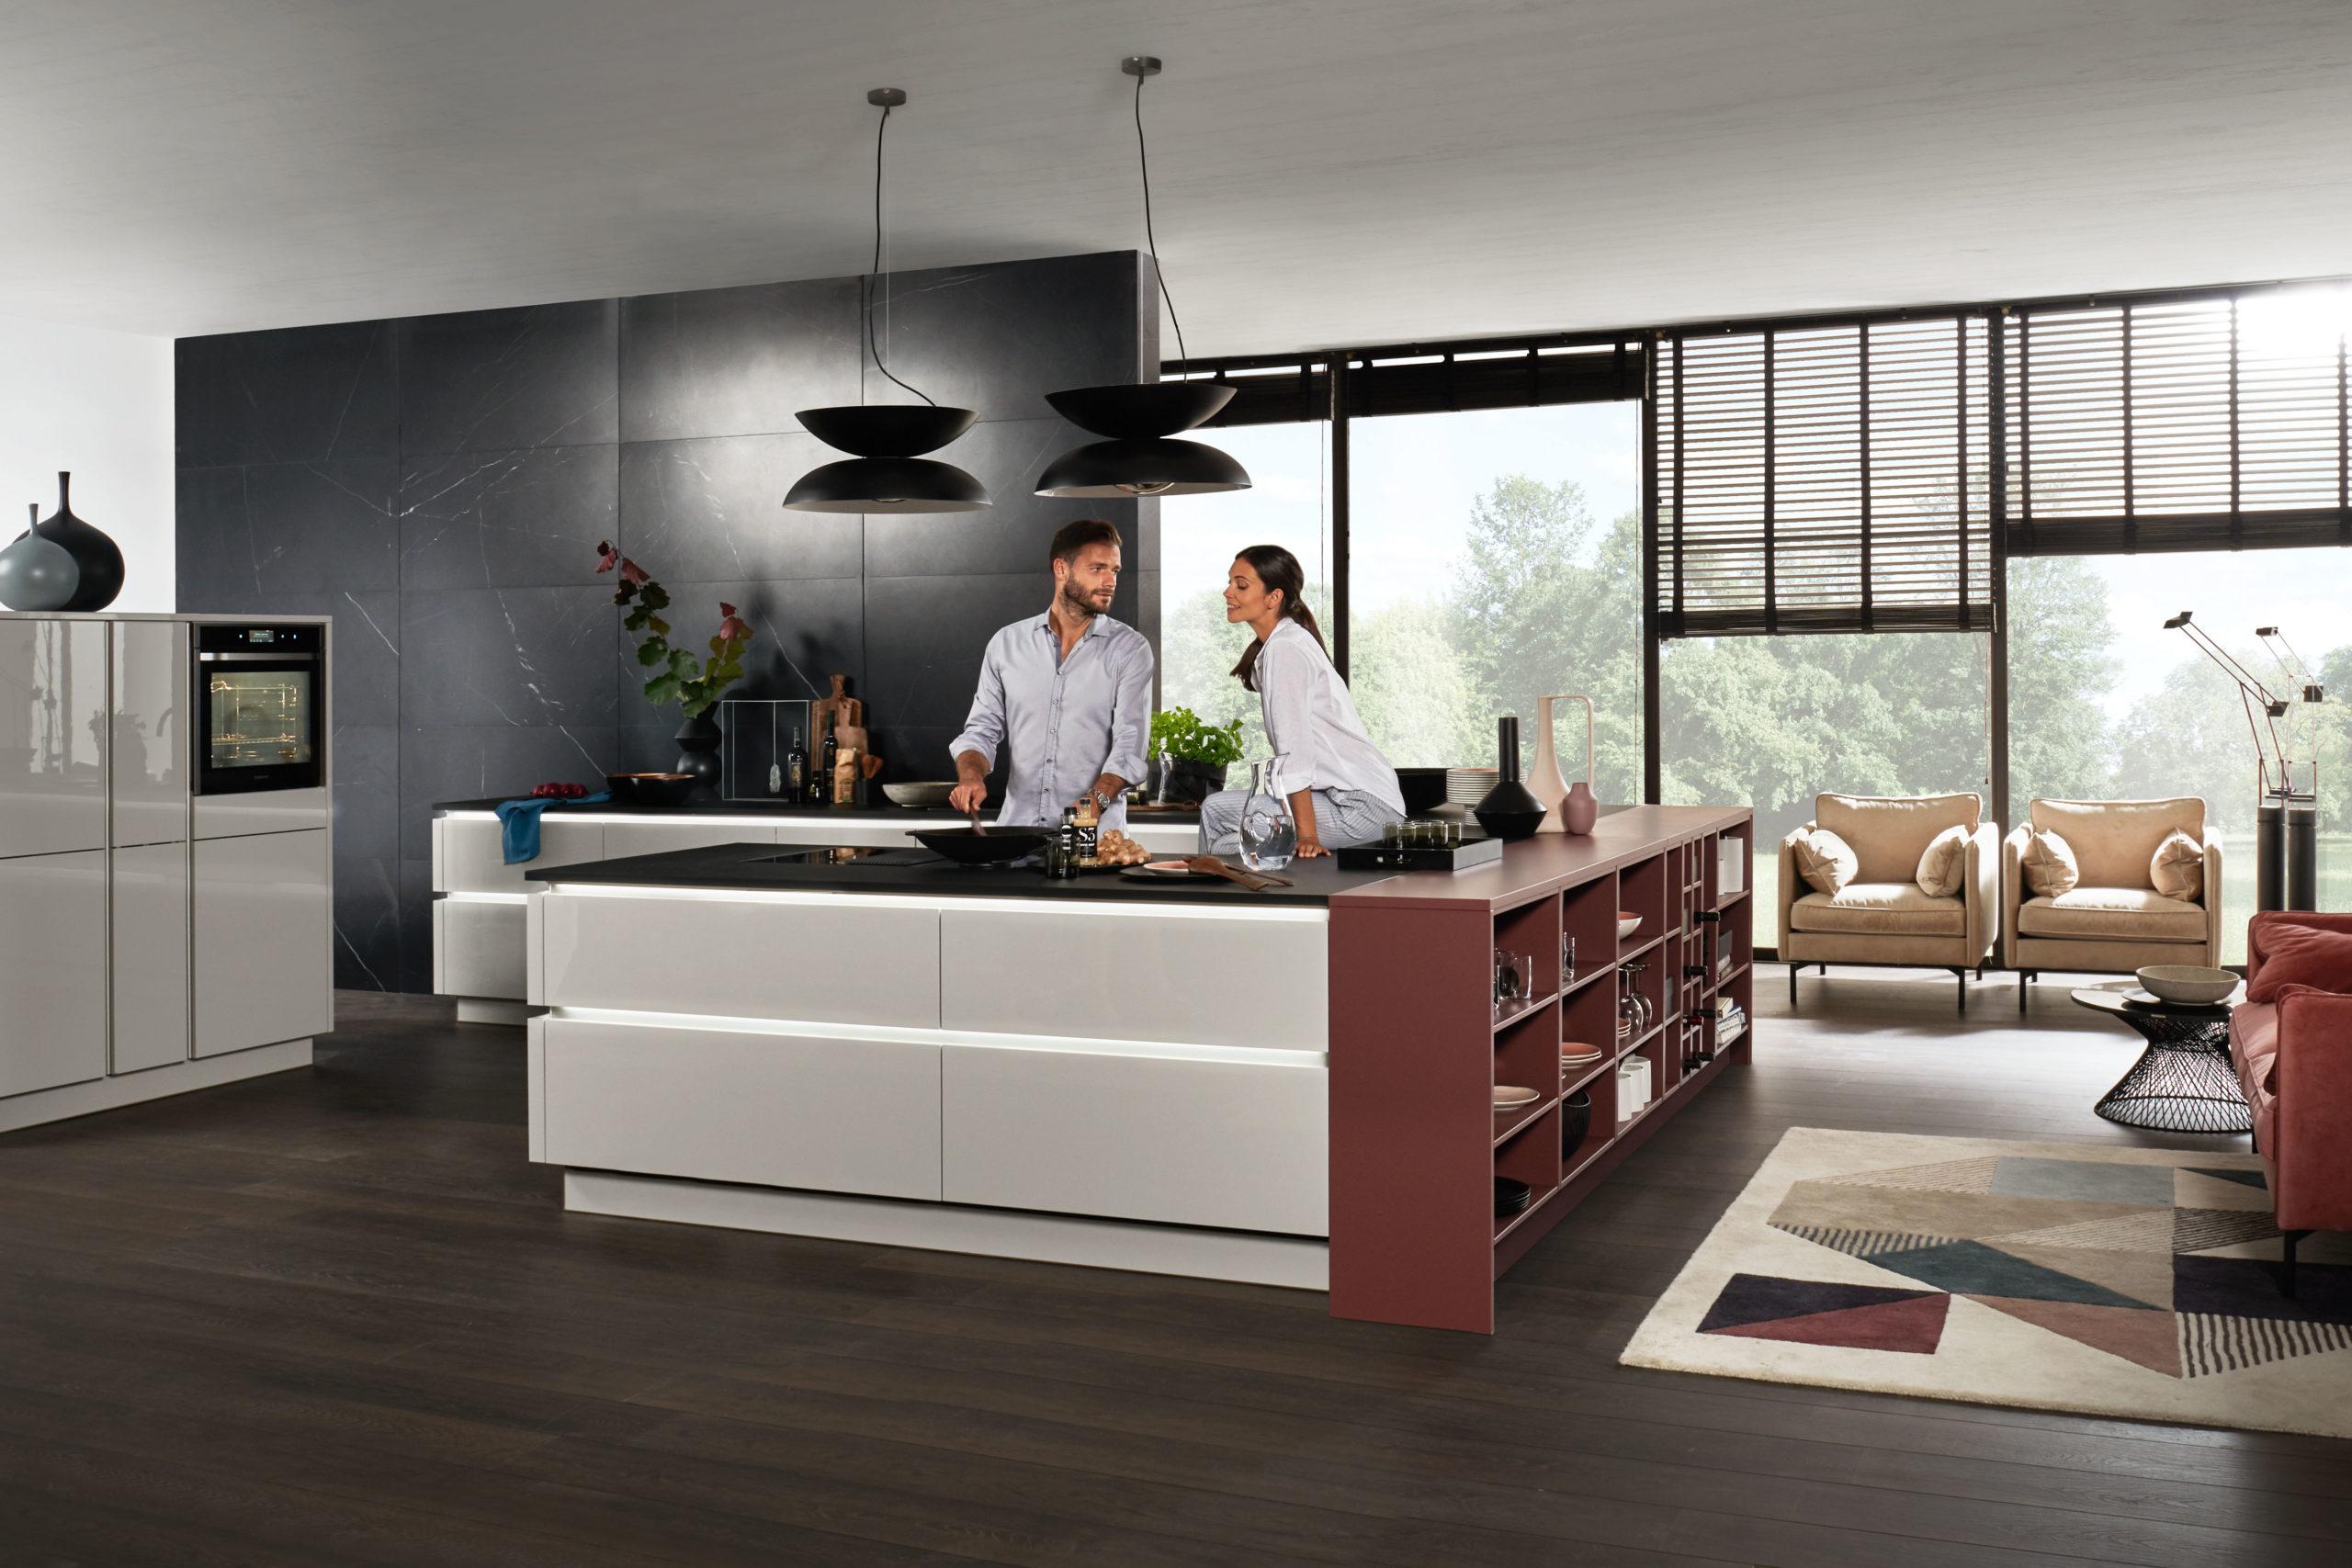 Nova Lack - Platingrau Hochglanz - Küchenplanung